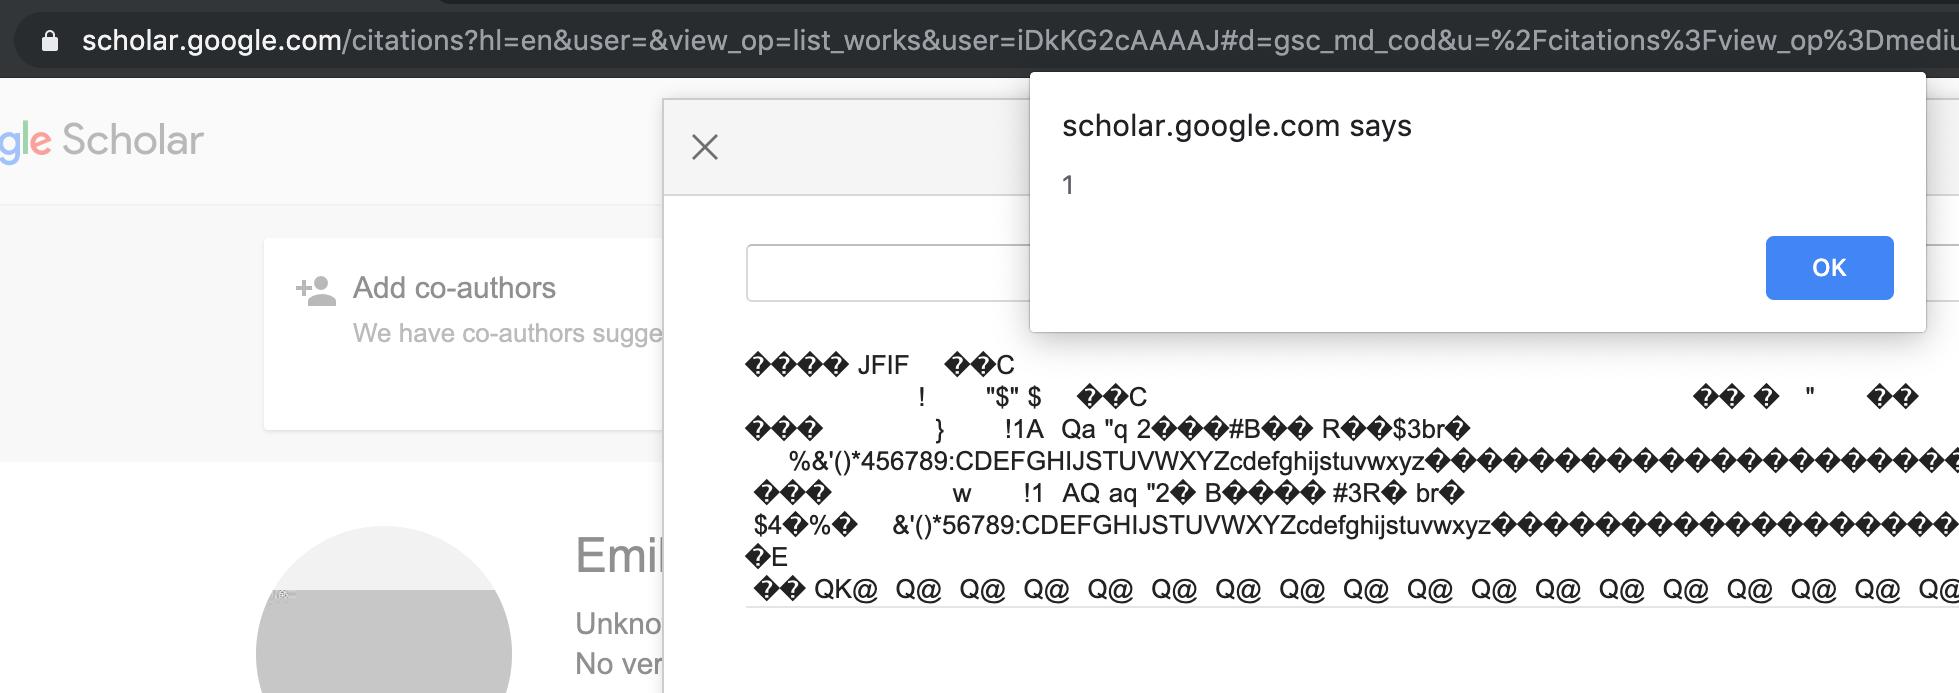 Exploitation result of the XSS PoC on Scholar